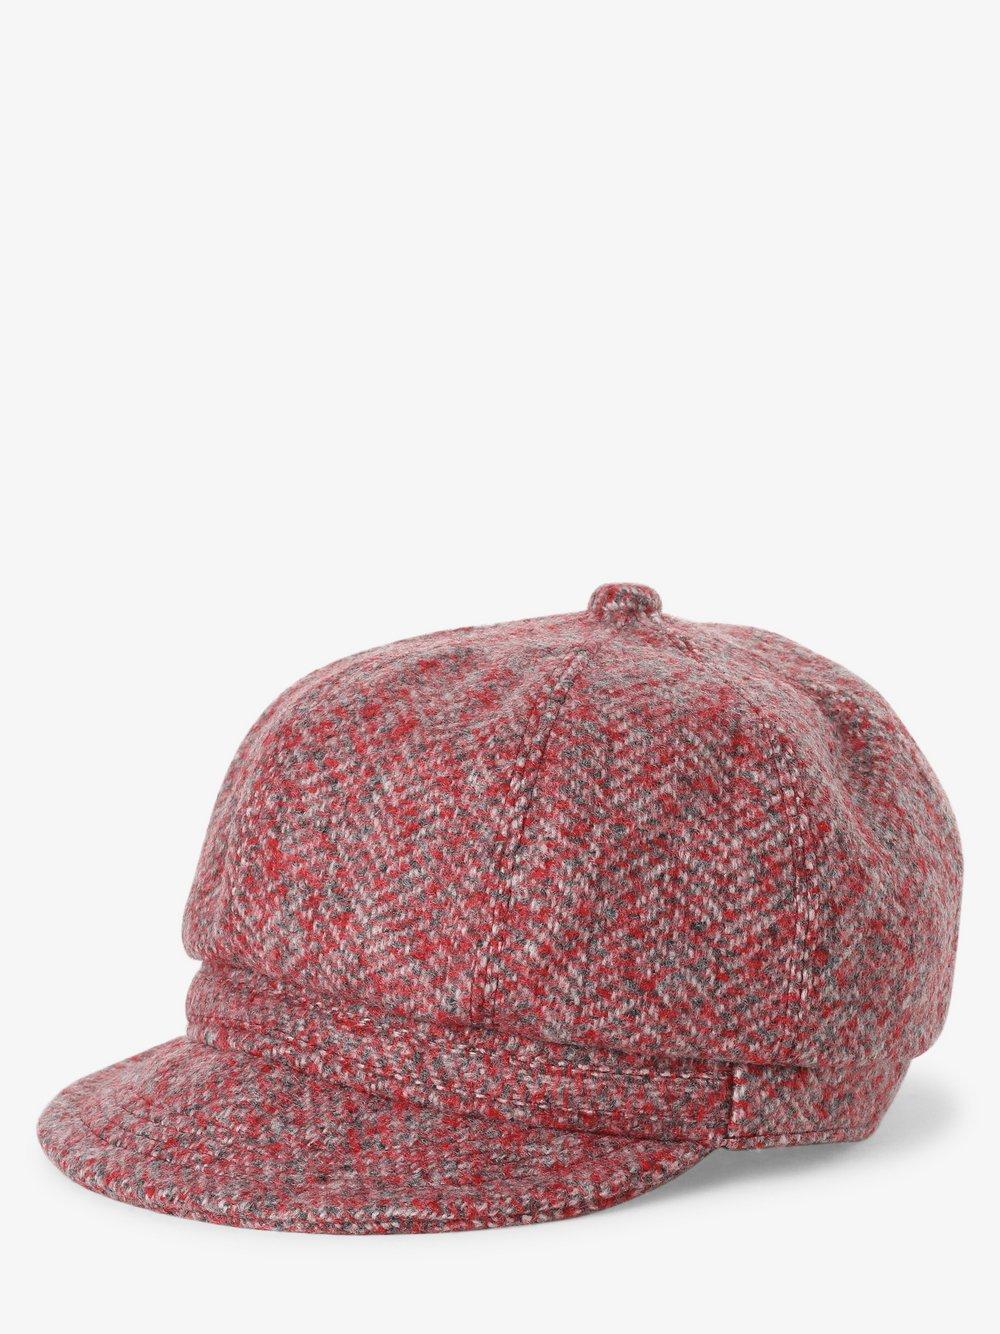 Loevenich – Czapka damska, czerwony Van Graaf 486213-0001